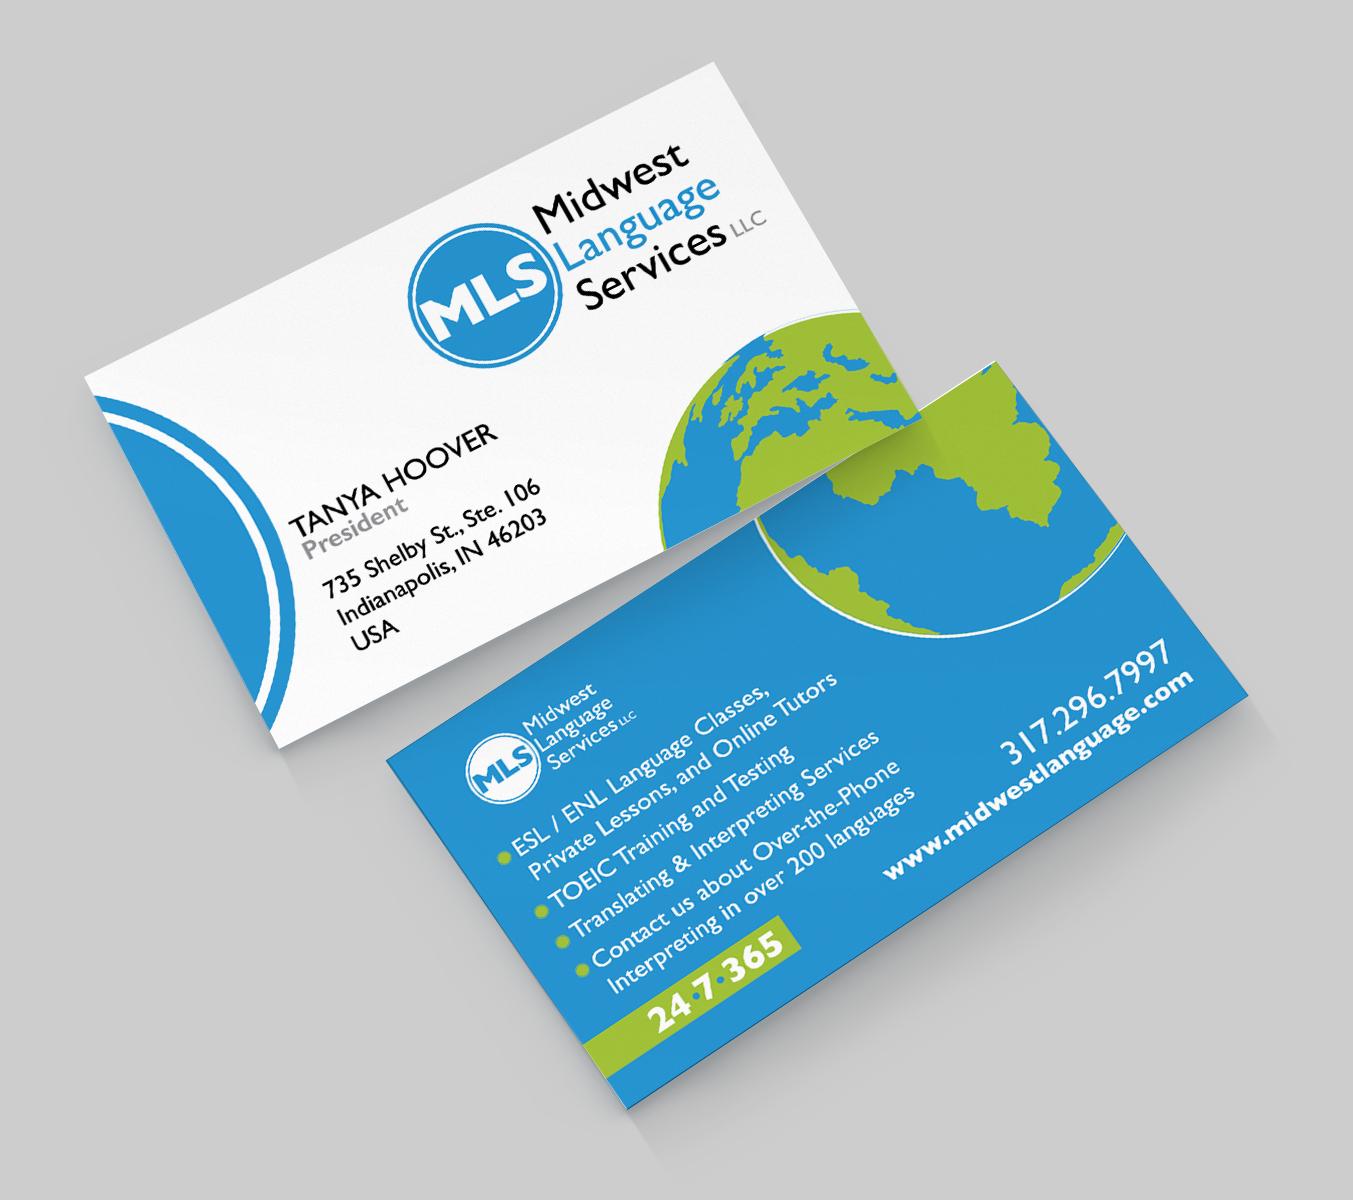 Serious modern business business card design for midwest language business card design by designseleni for midwest language services llc reheart Choice Image